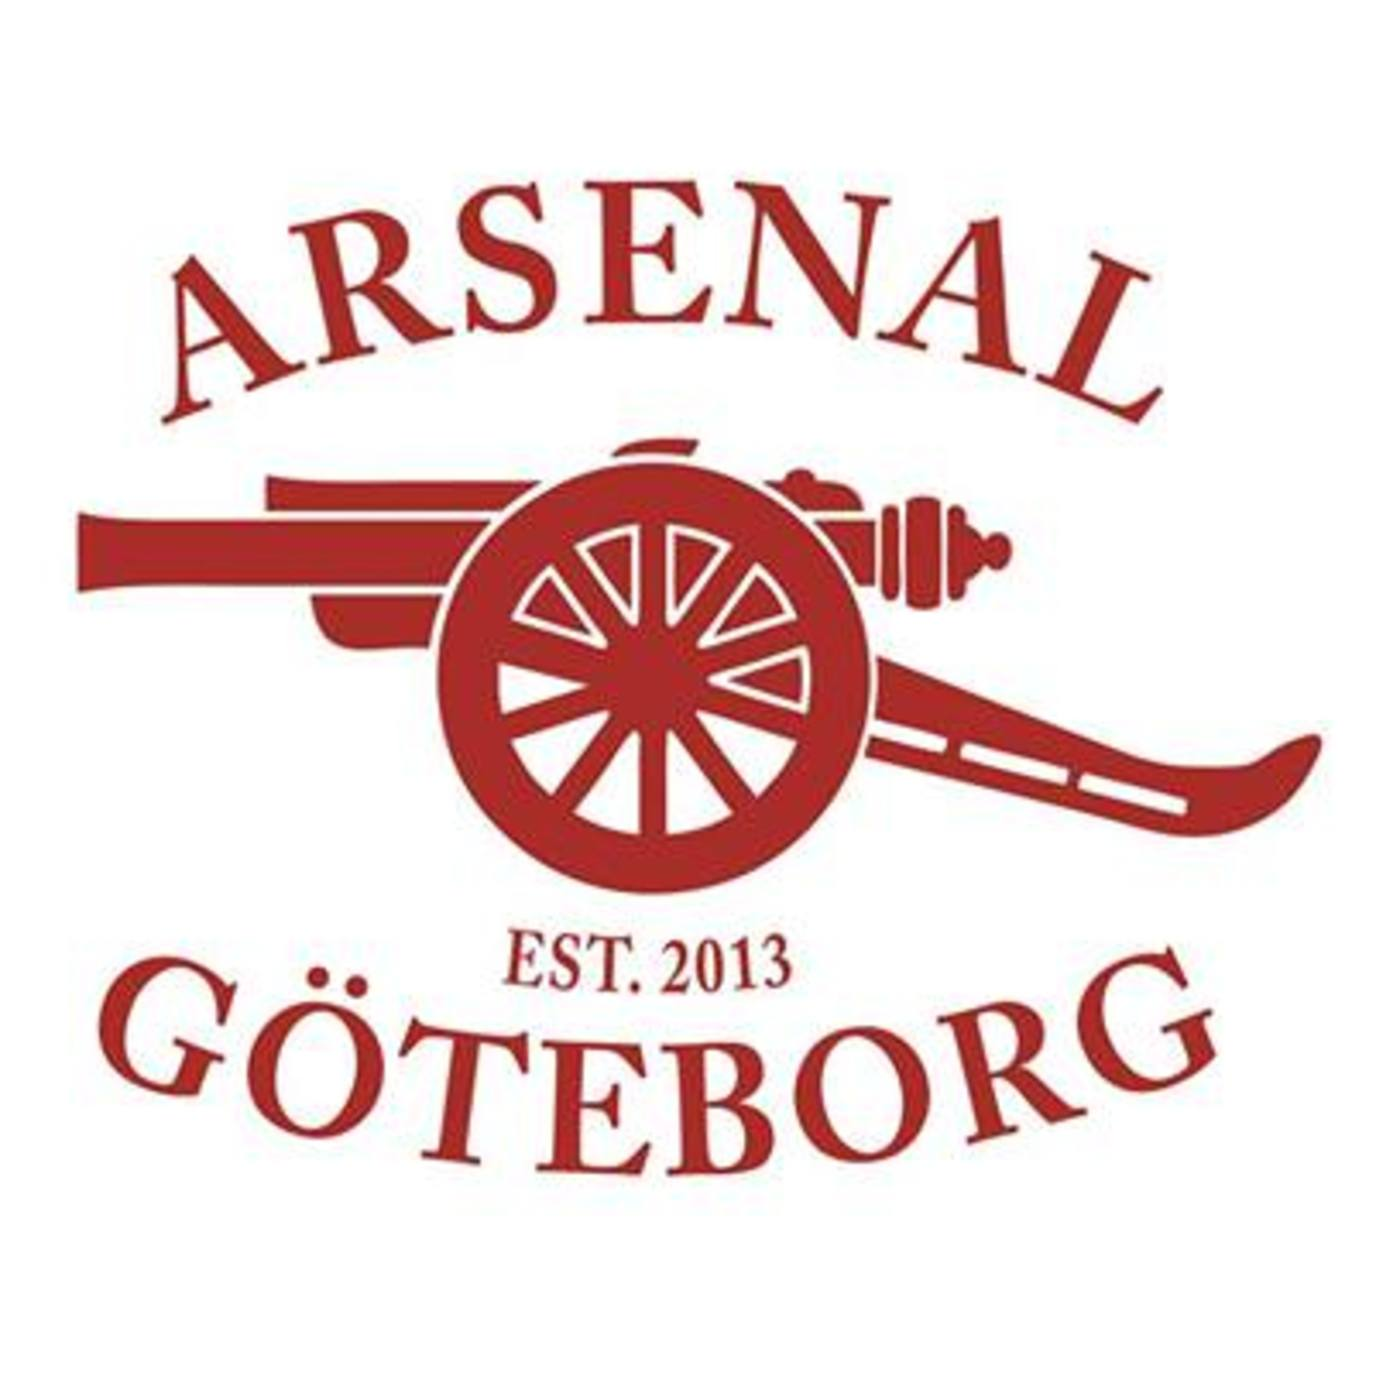 Arsenal Göteborg Podcast